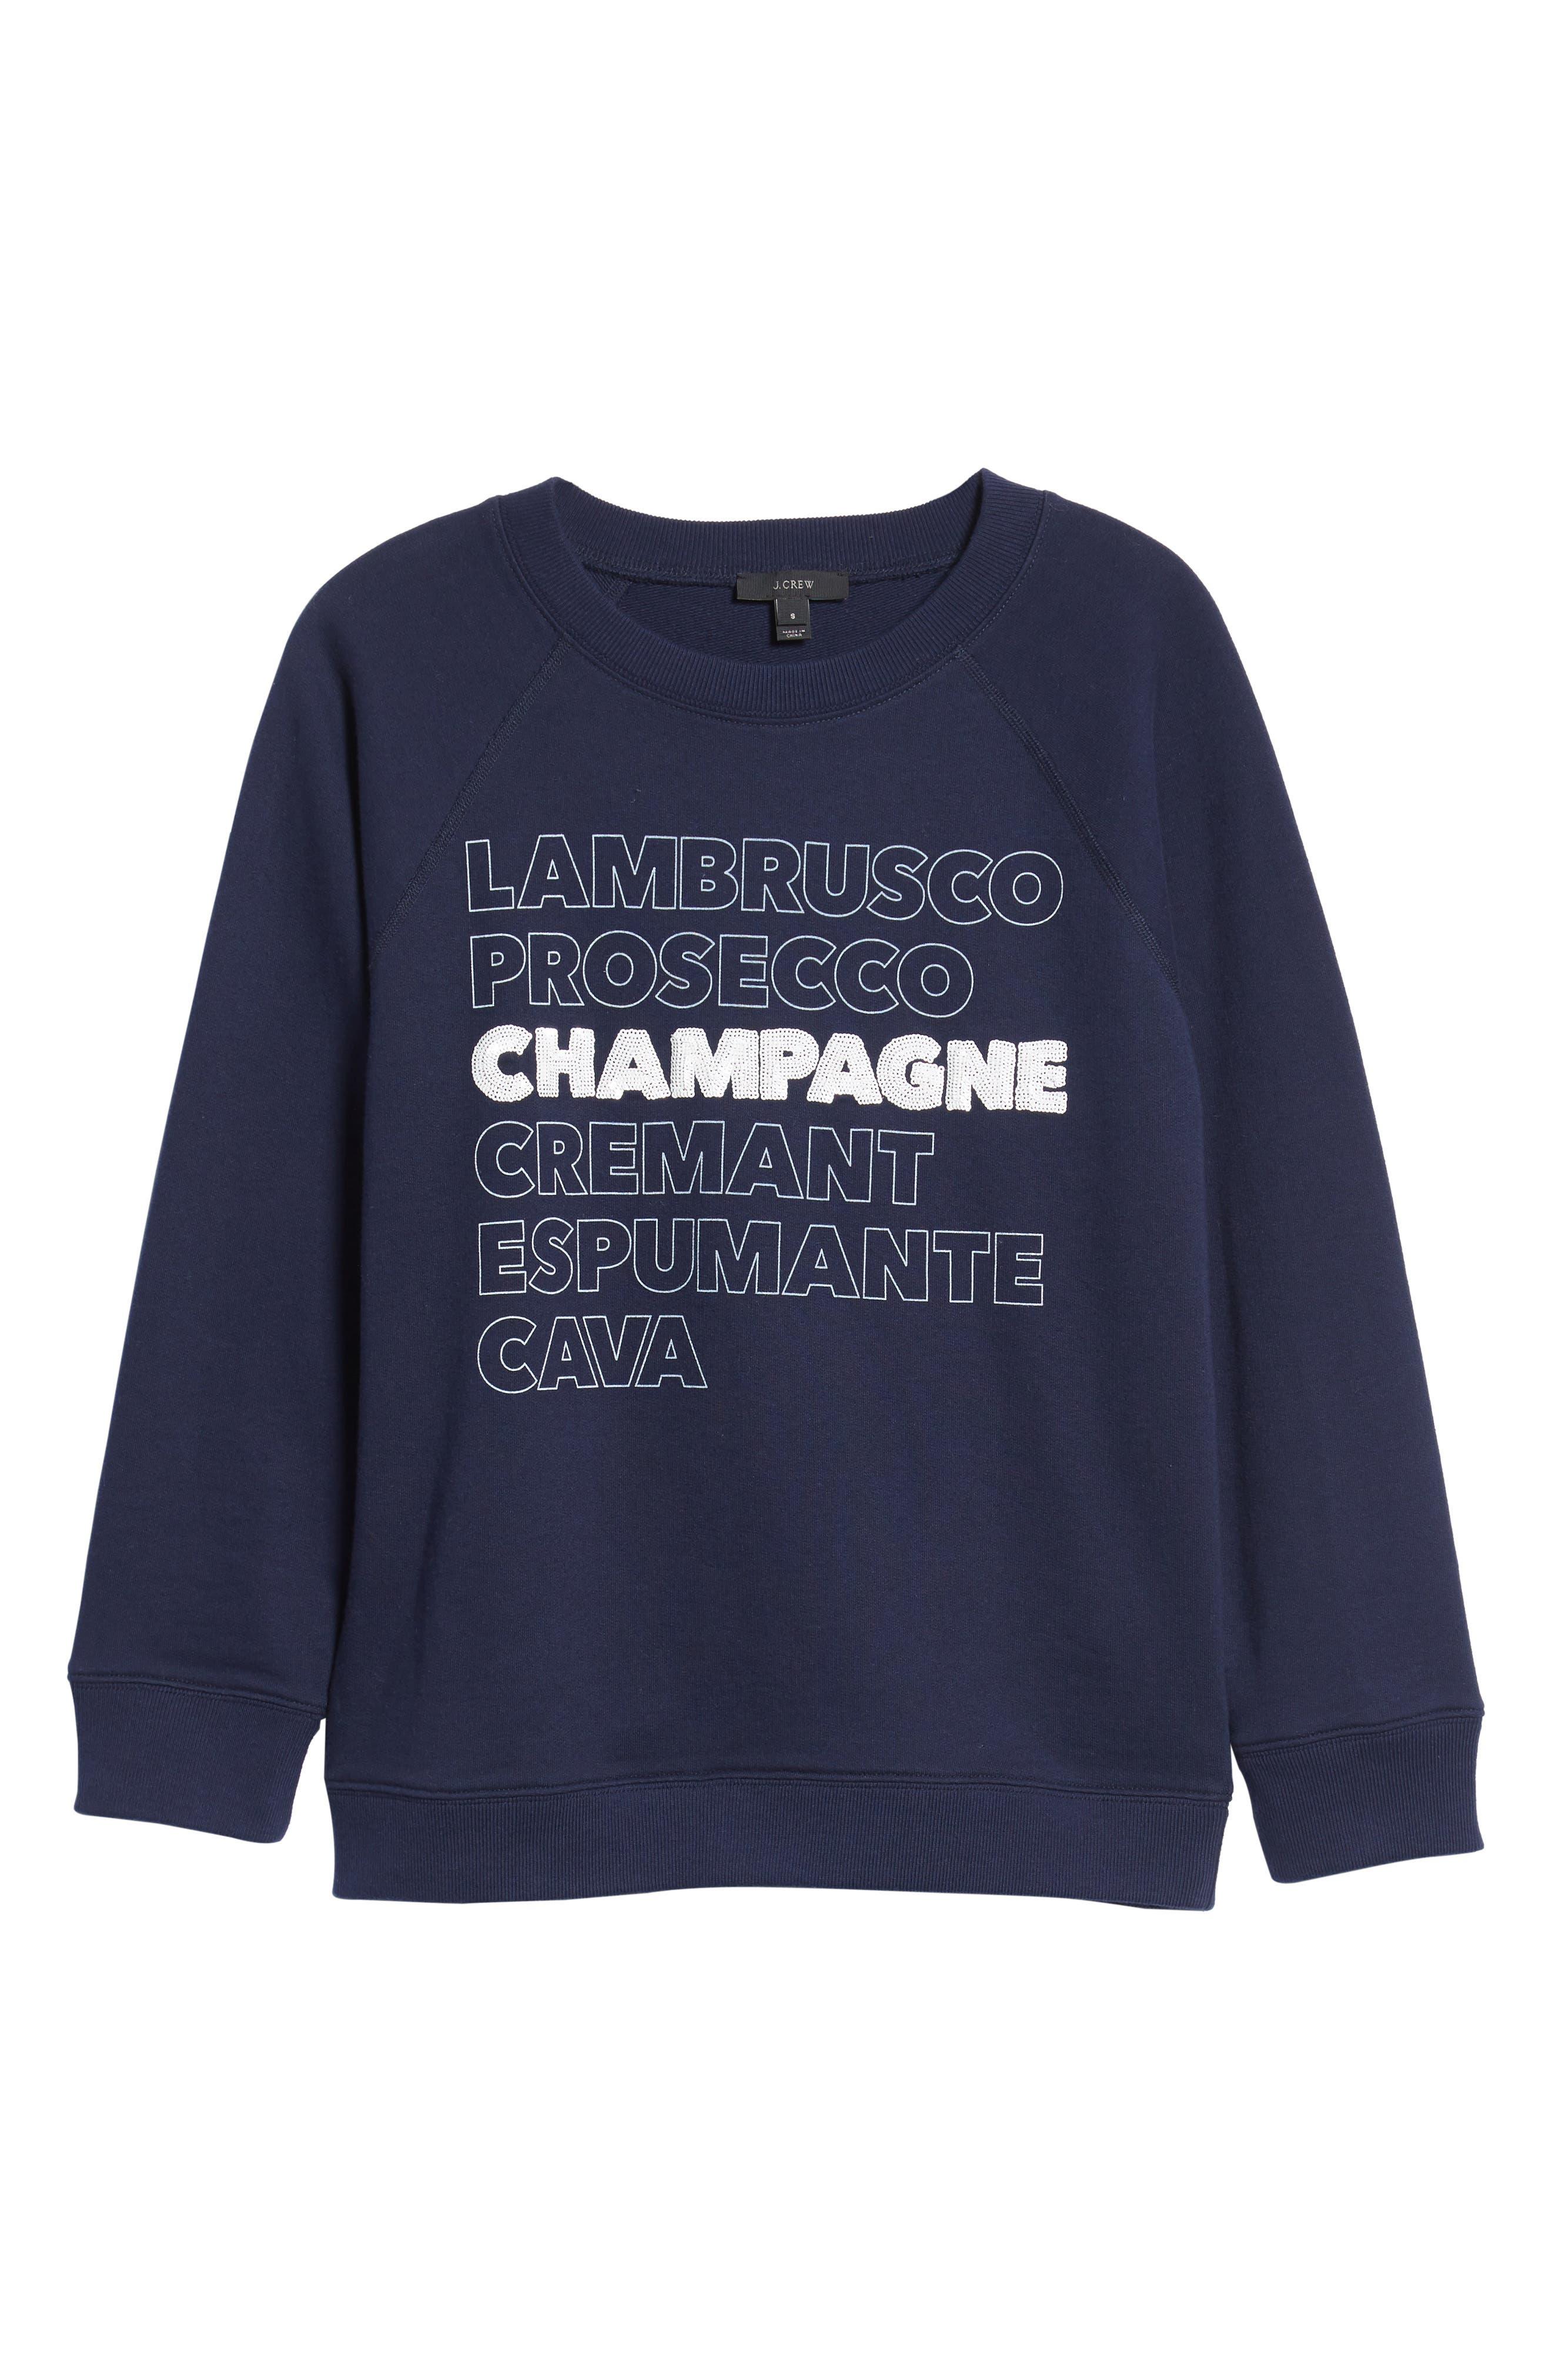 J.CREW, Champagne Sweatshirt, Alternate thumbnail 6, color, 400